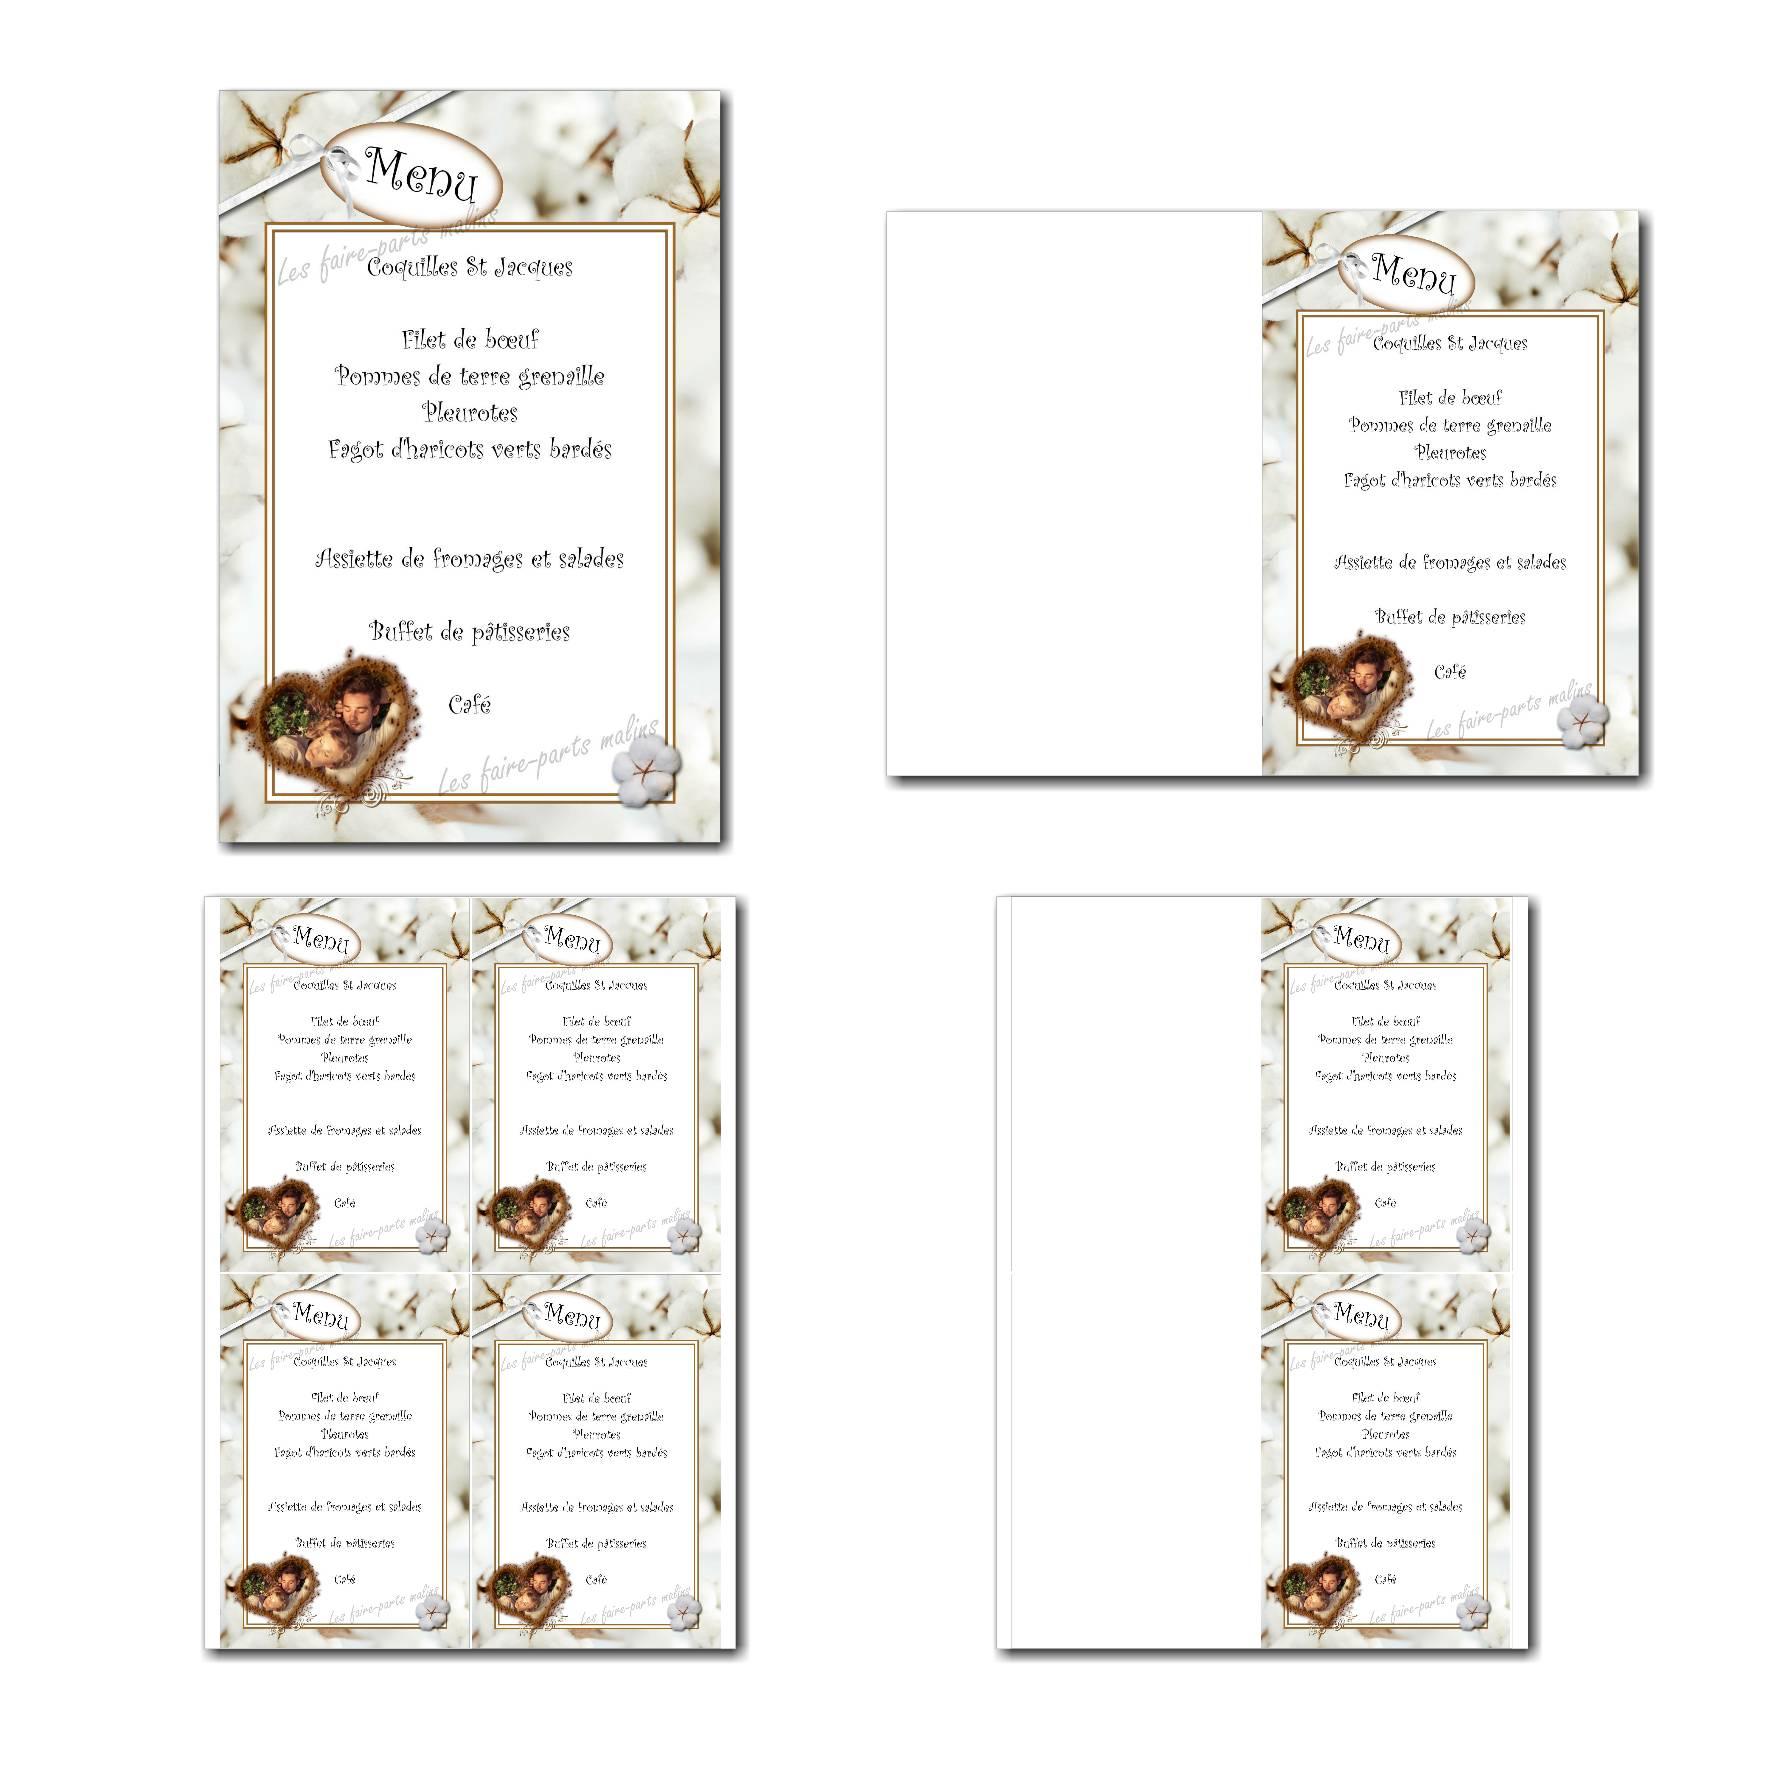 Pai 49 mariage menu 10x15